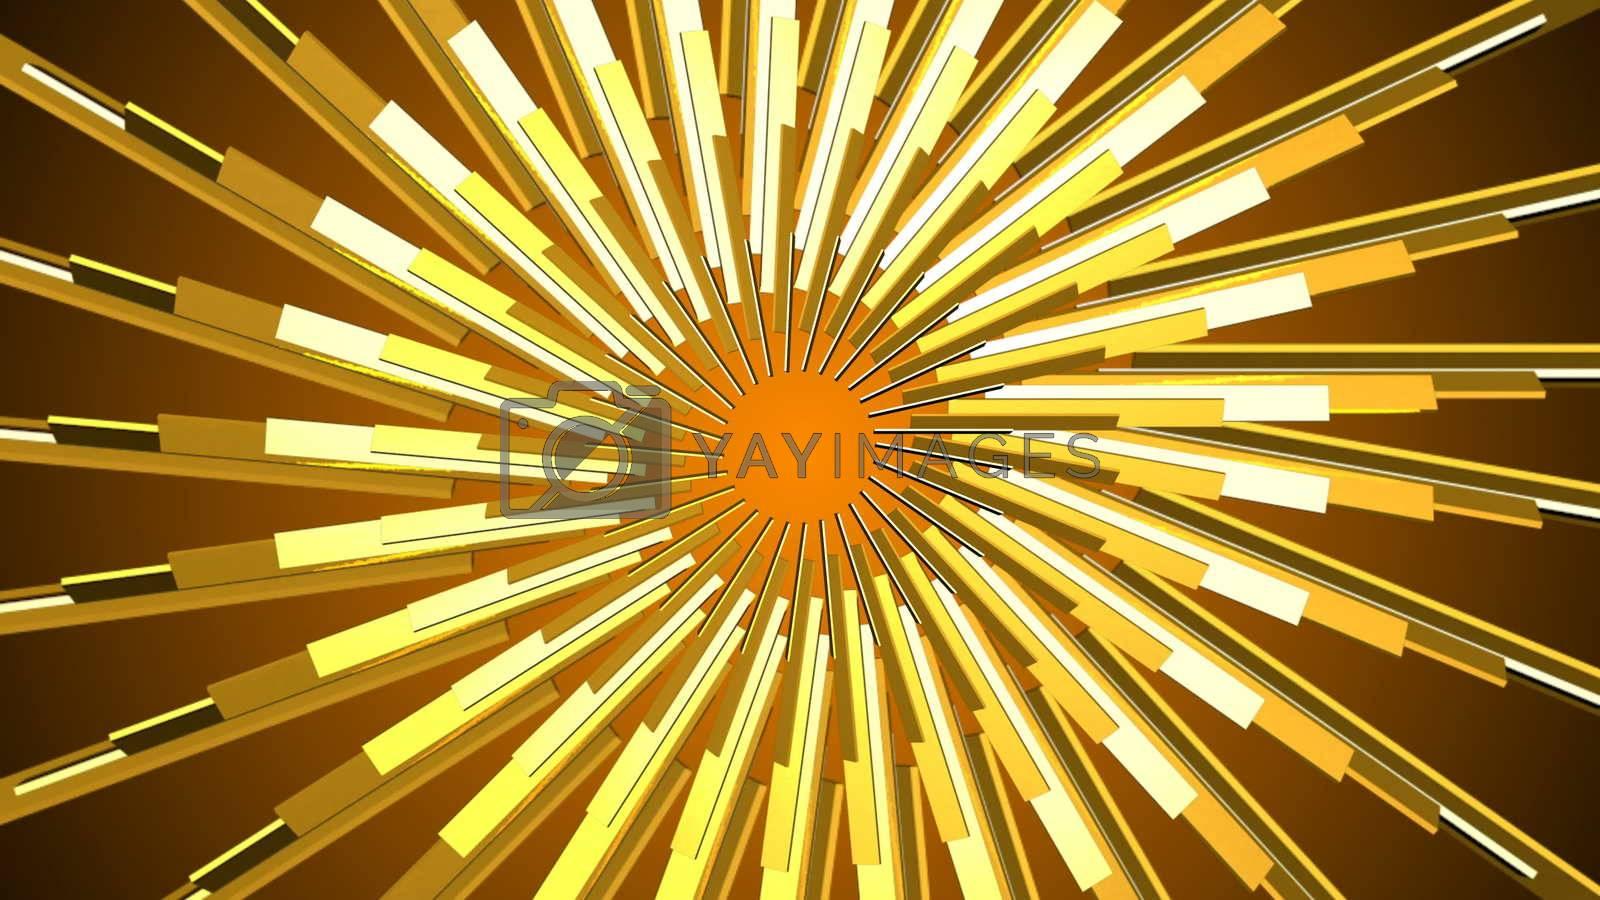 Abstract gold element. Fractal golden background. Mirror